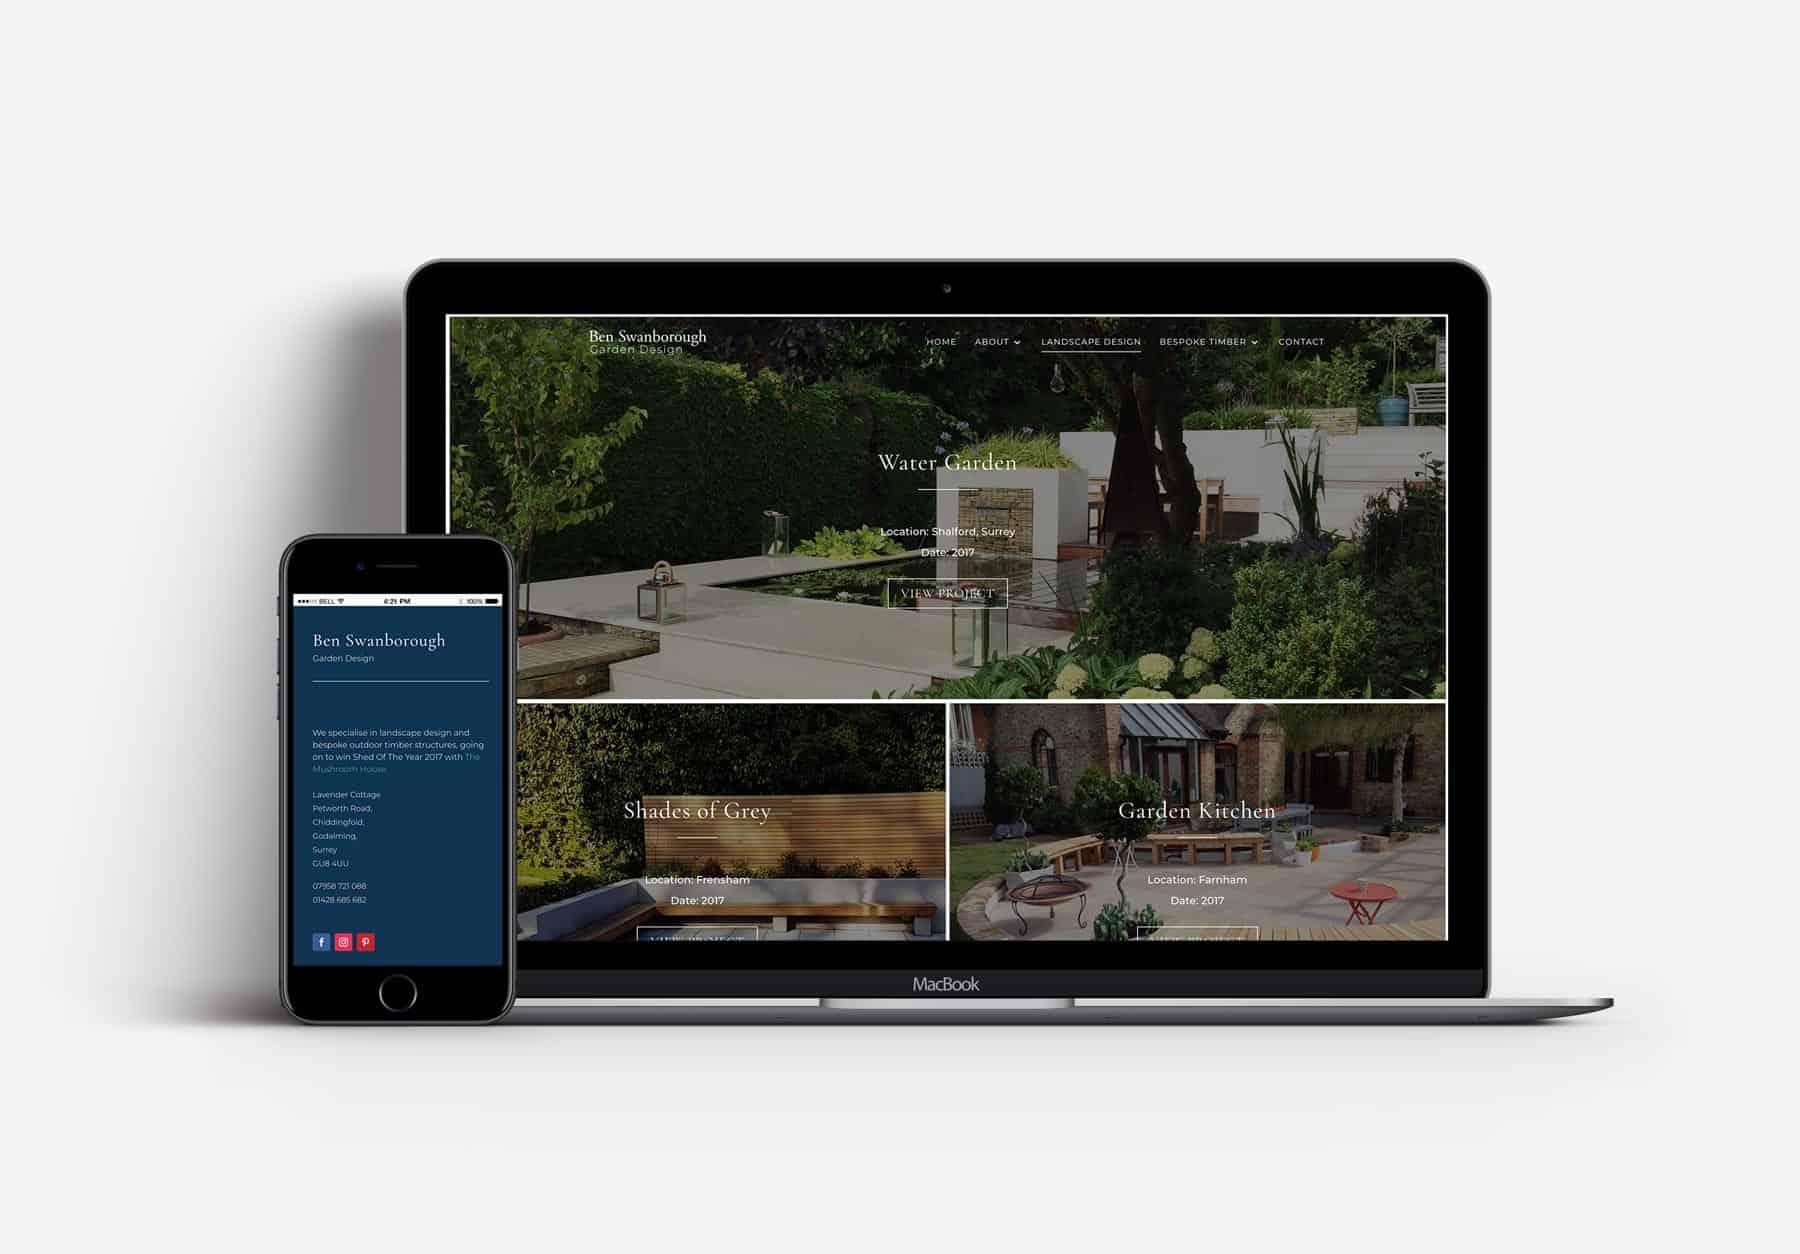 repsonsive web design for landscape designers